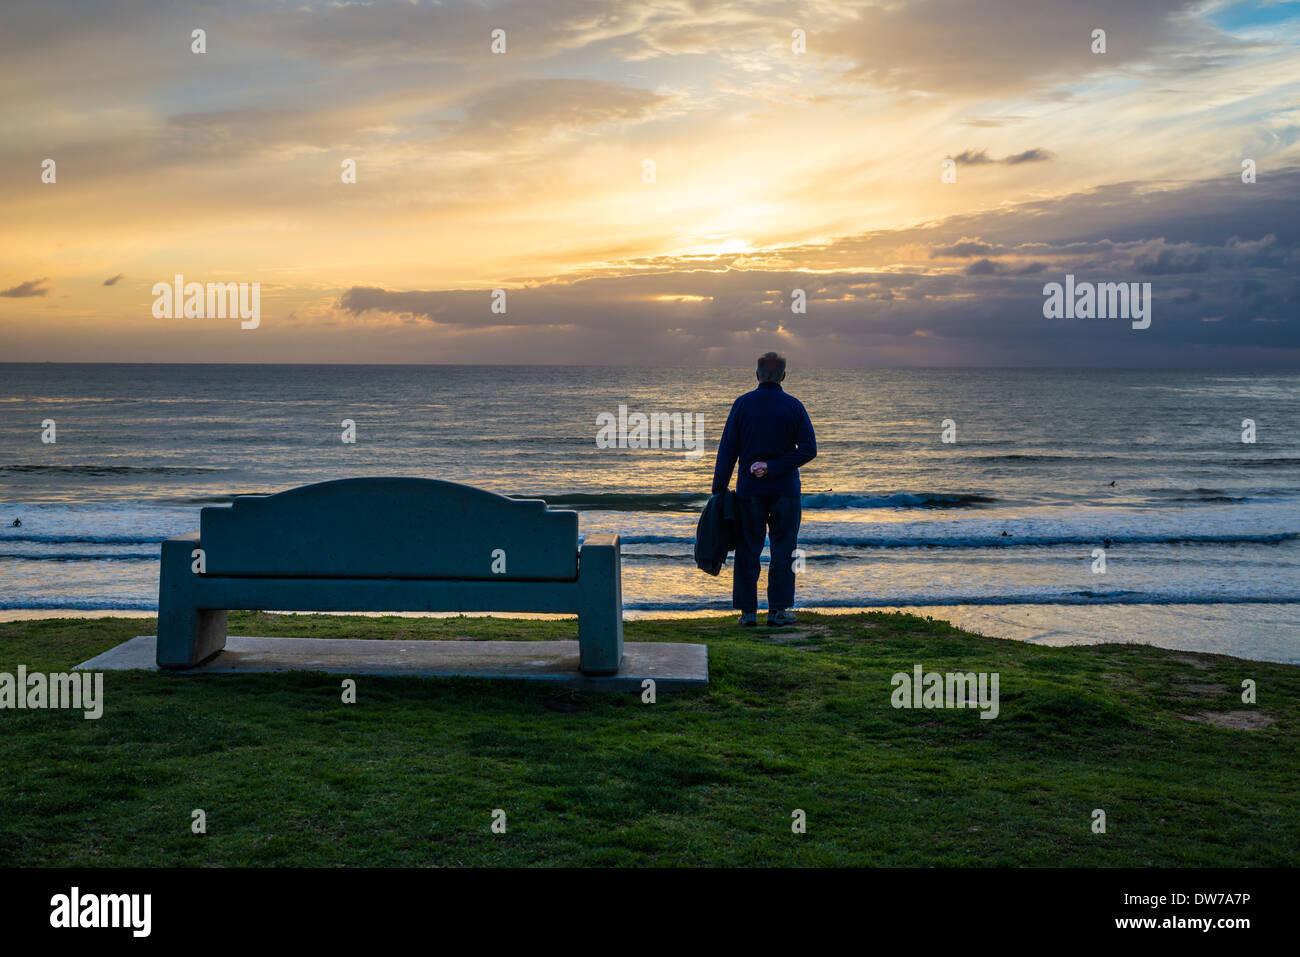 Coastal sunset from Law Street Park. San Diego, California, United States. Stock Photo